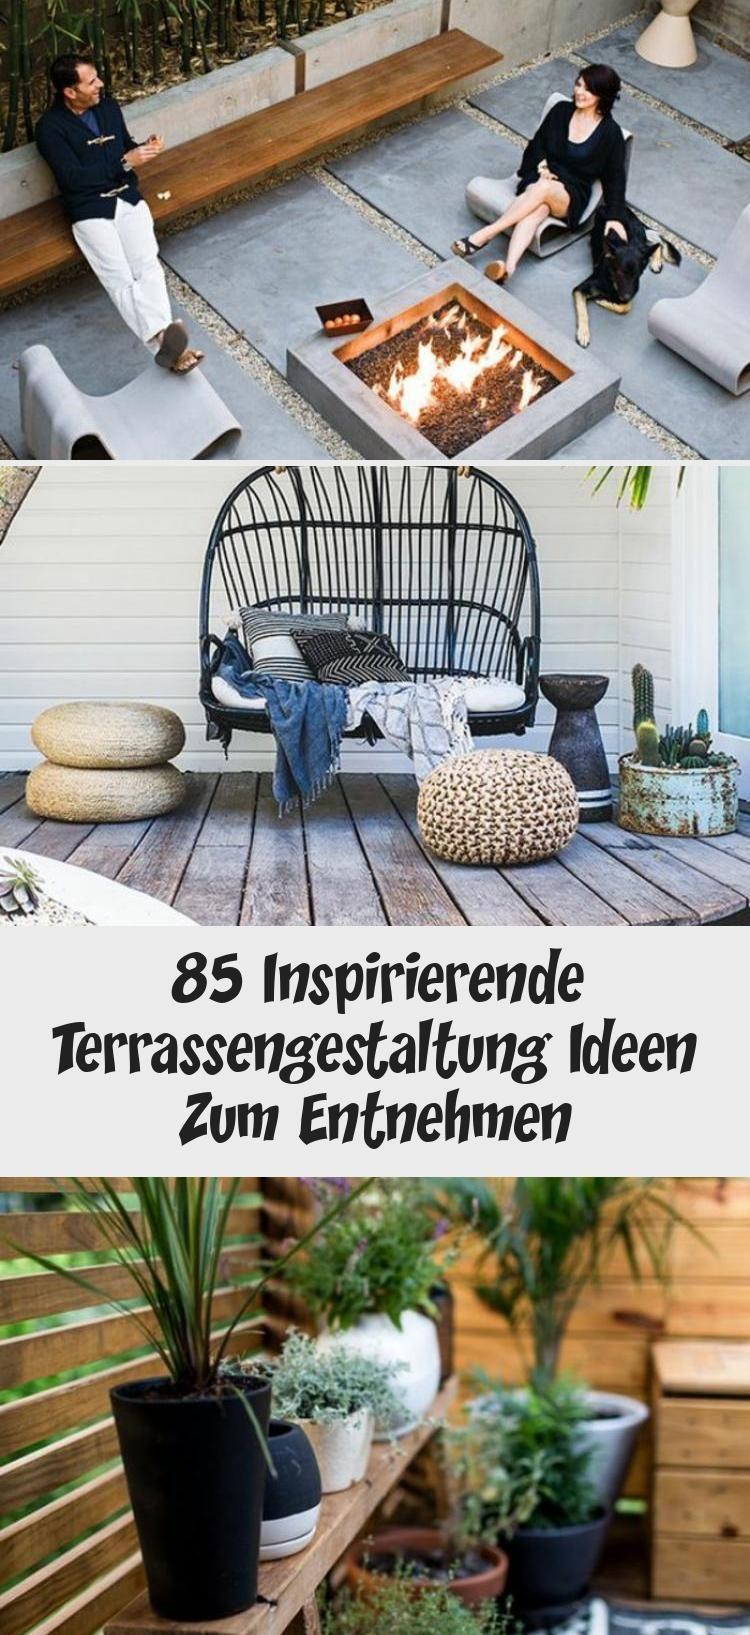 Photo of 85 Inspirierende Terrassengestaltung Ideen Zum Entnehmen – DE